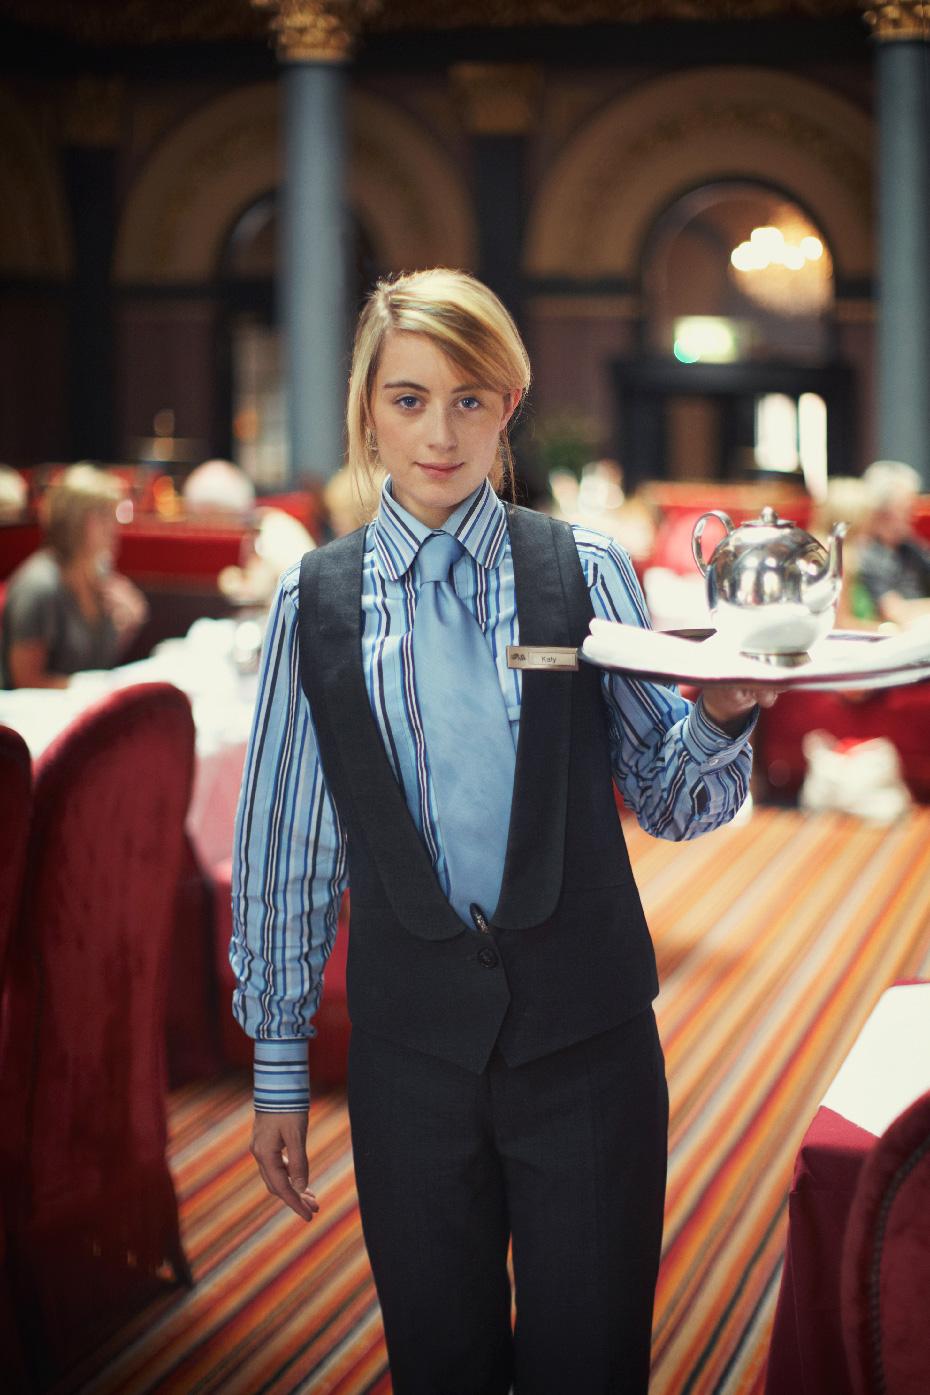 Stacey Van Berkel Photography I Beautiful Irish Girl serving High Tea at the Historic Merchant Hotel I Belfast, Northern Ireland